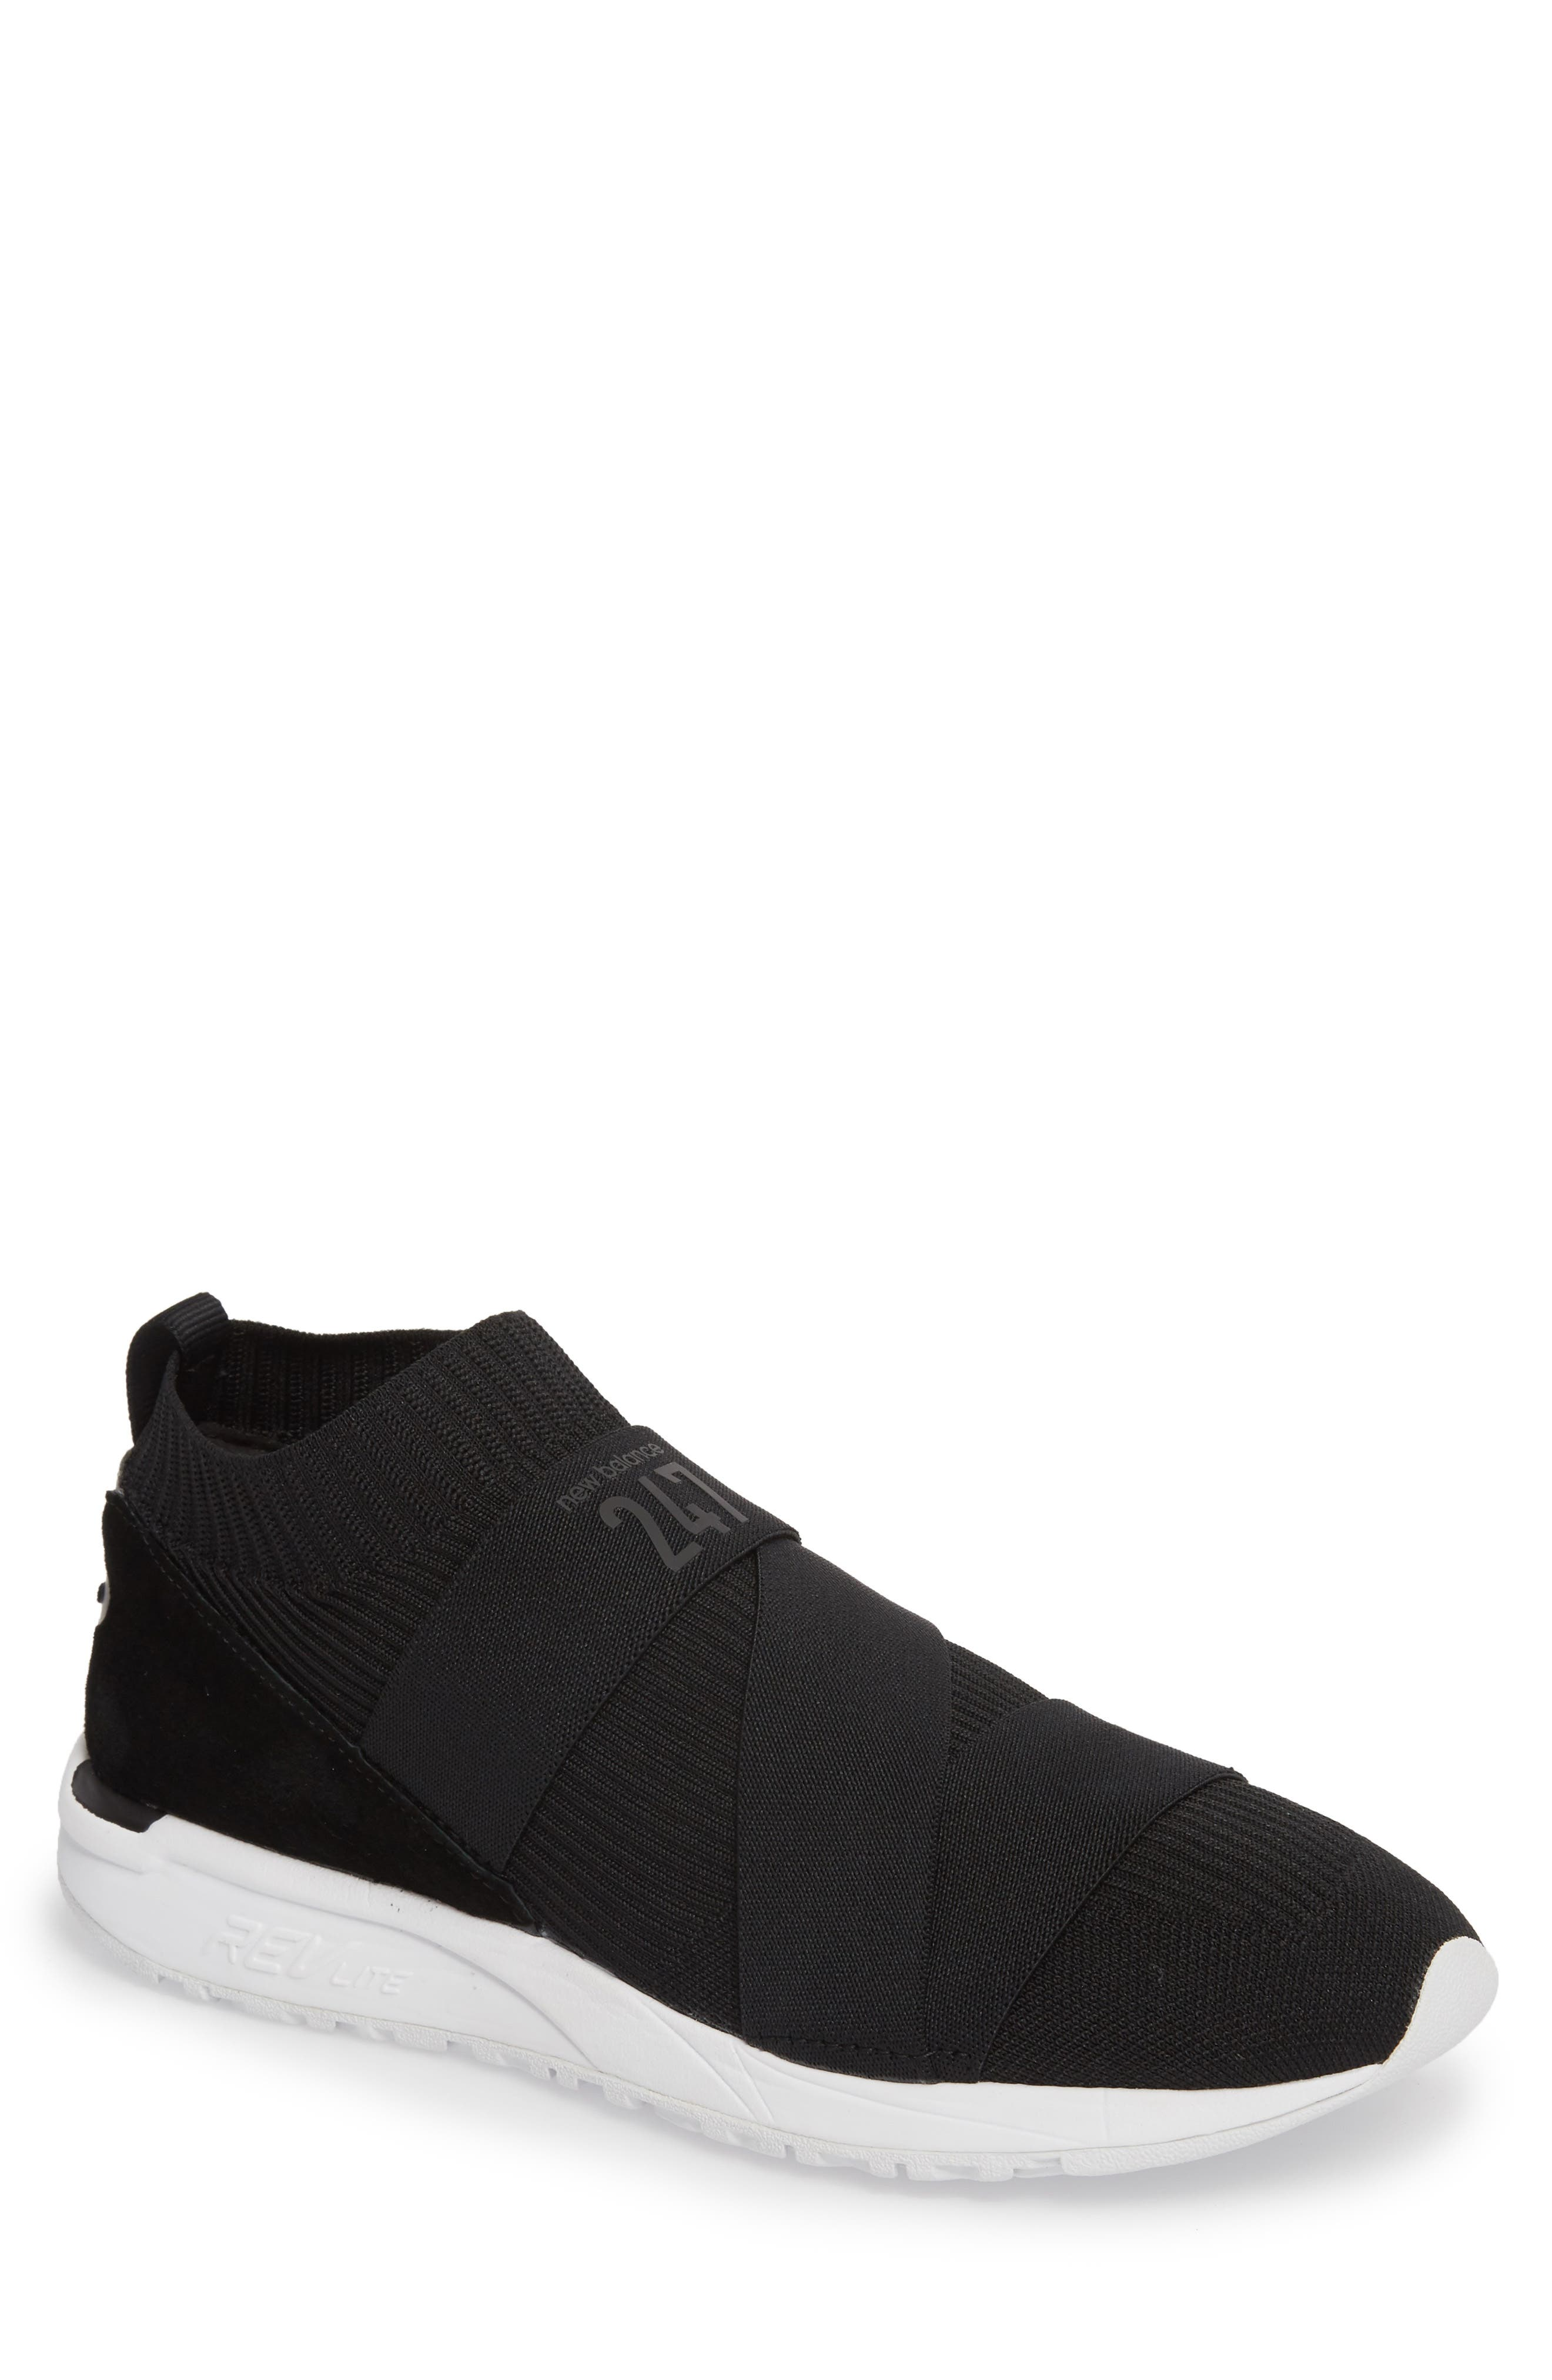 New Balance 247 Knit Sneaker In Black | ModeSens